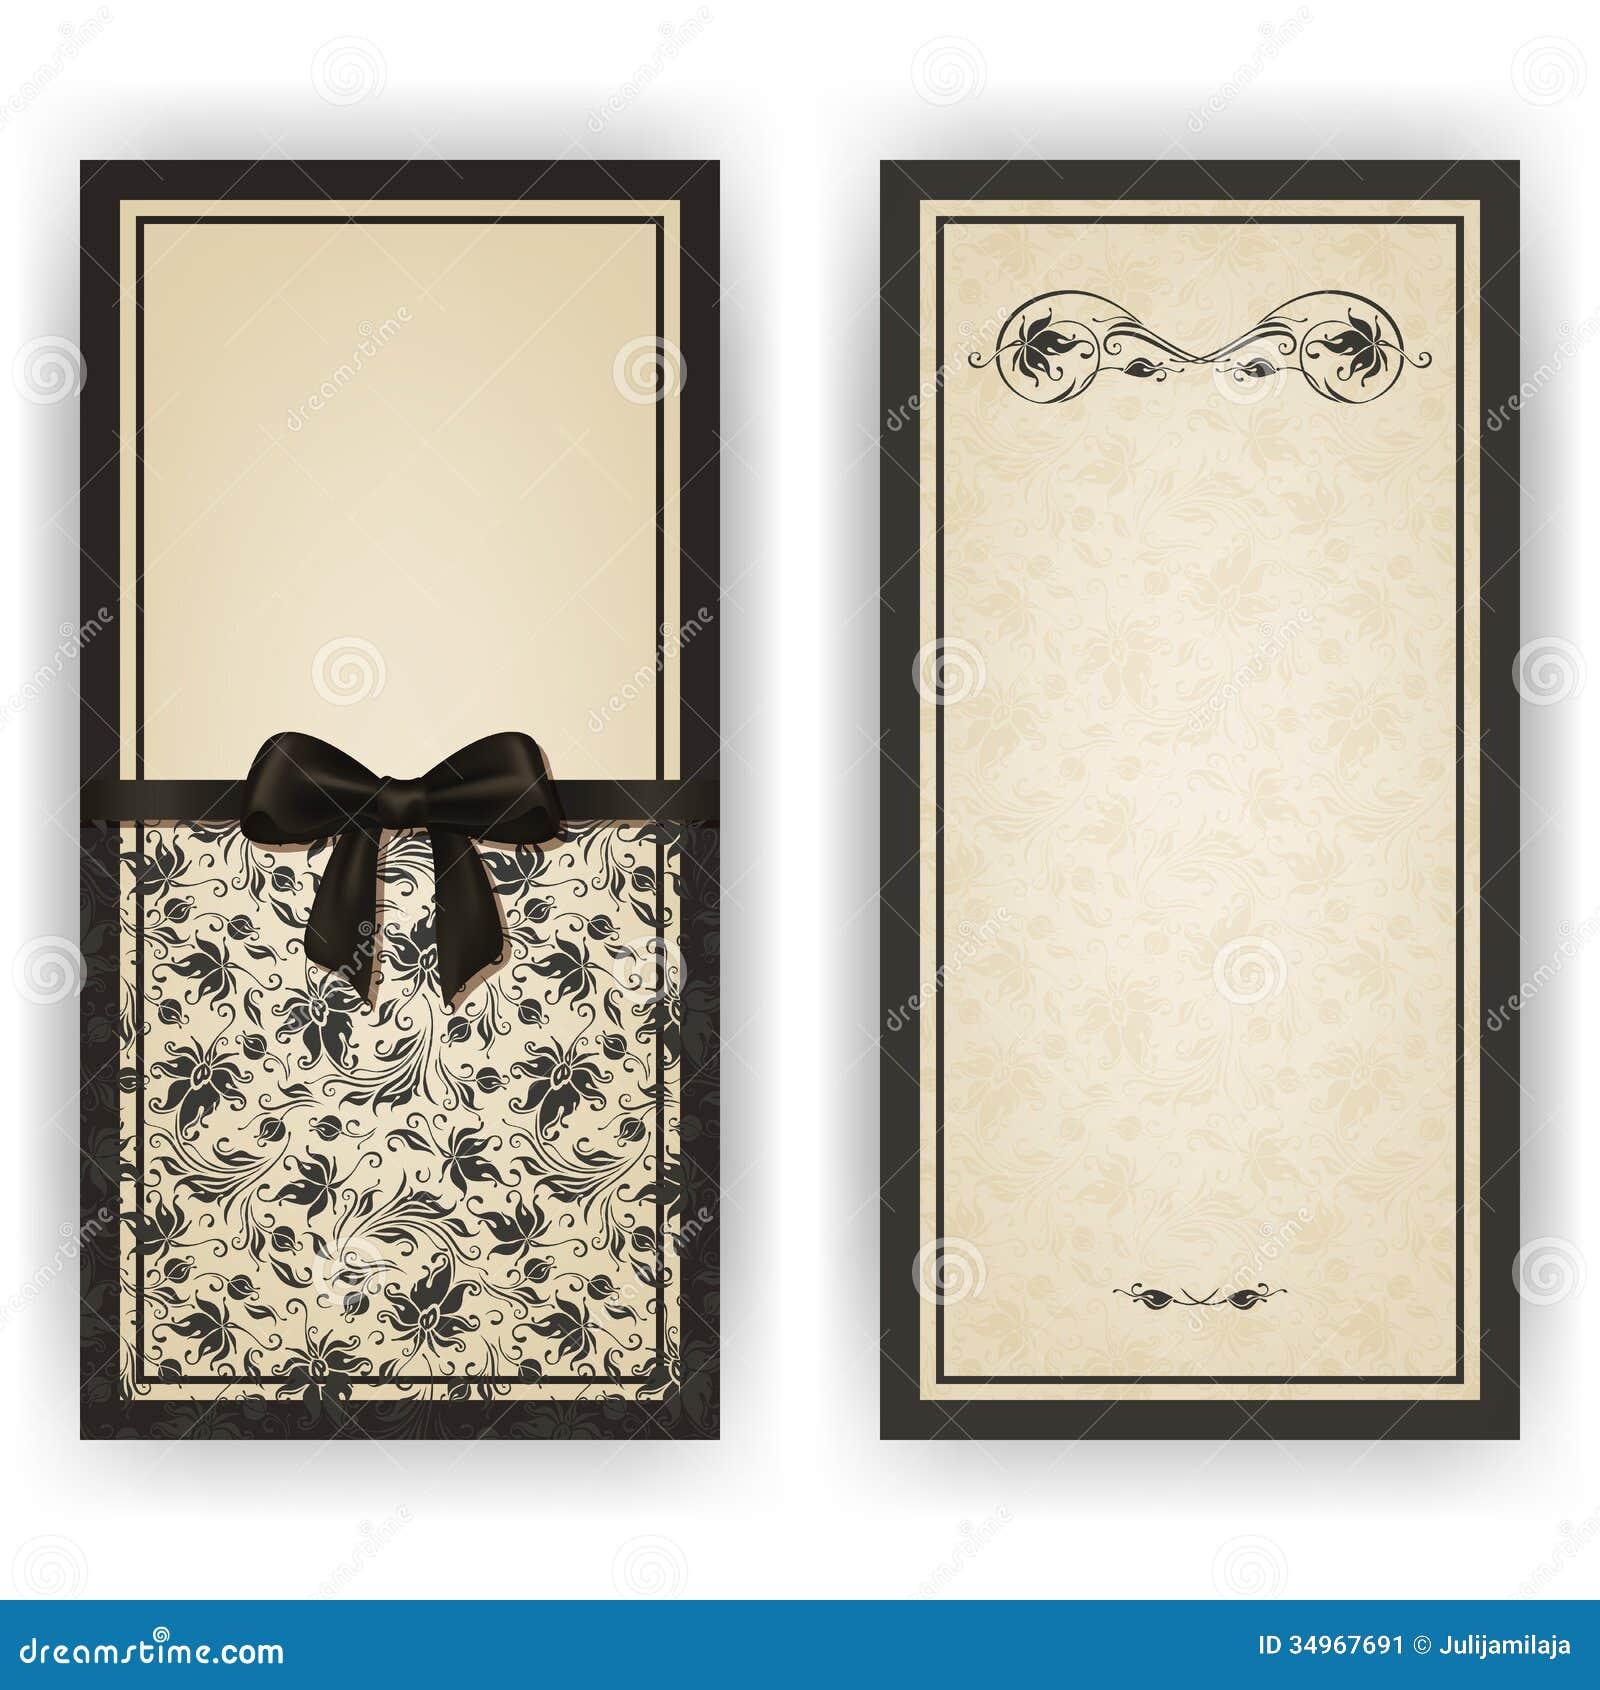 Elegant Vector Template For Luxury Invitation, Stock Image - Image: 34967691